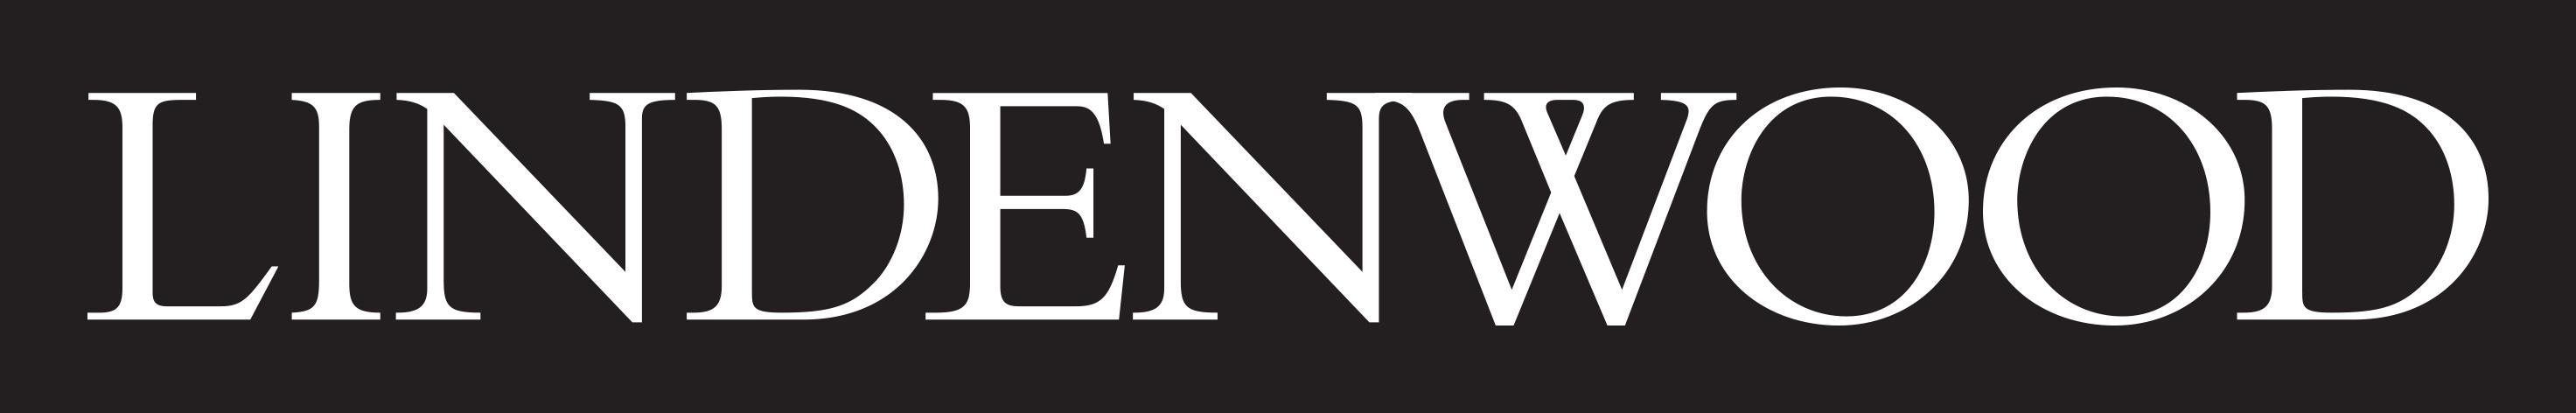 Lindenwood - Primary Logo Reversed